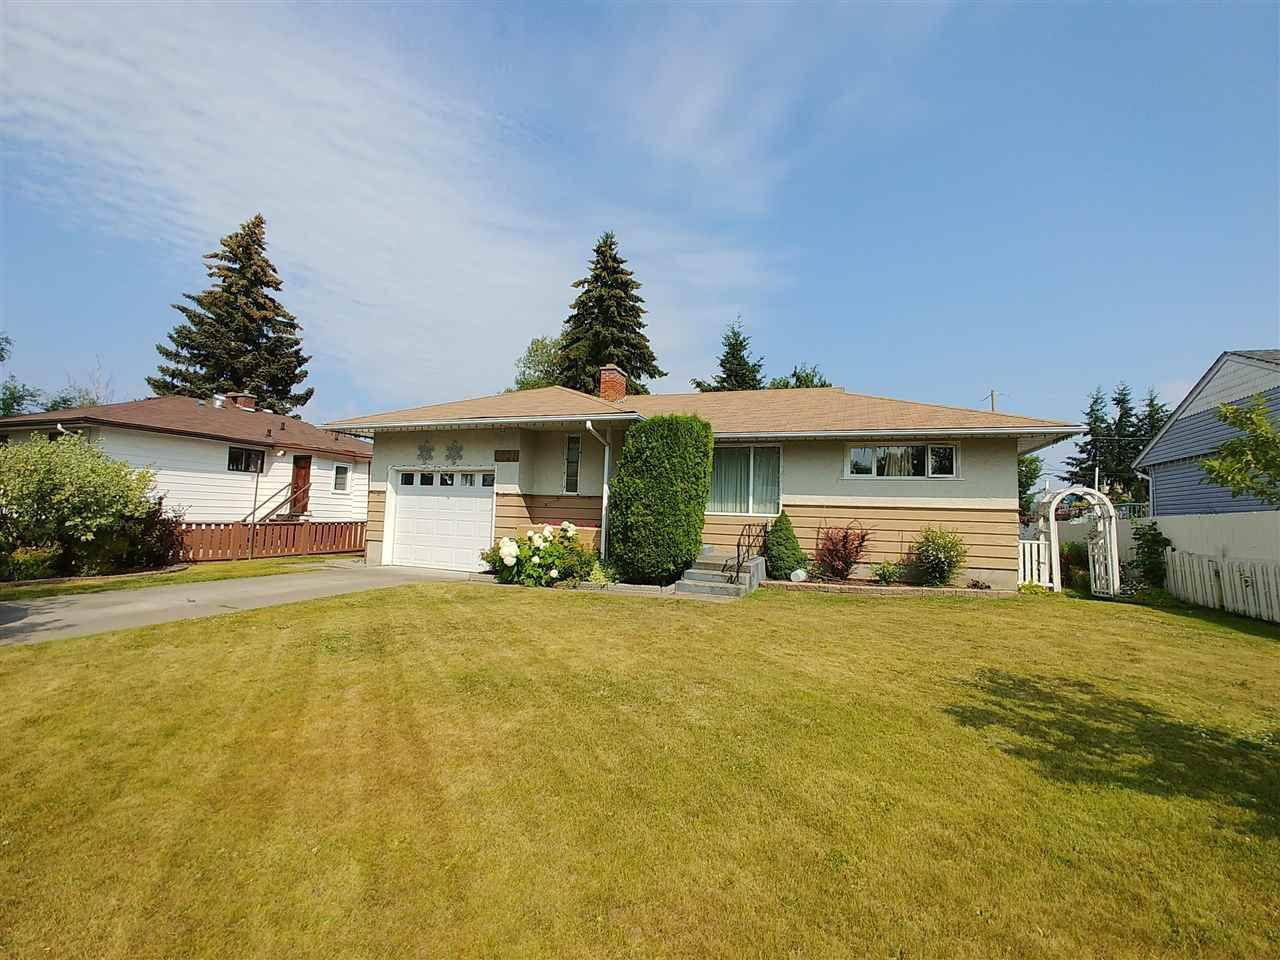 Main Photo: 1526 ALWARD STREET in : Seymour House for sale : MLS®# R2295941